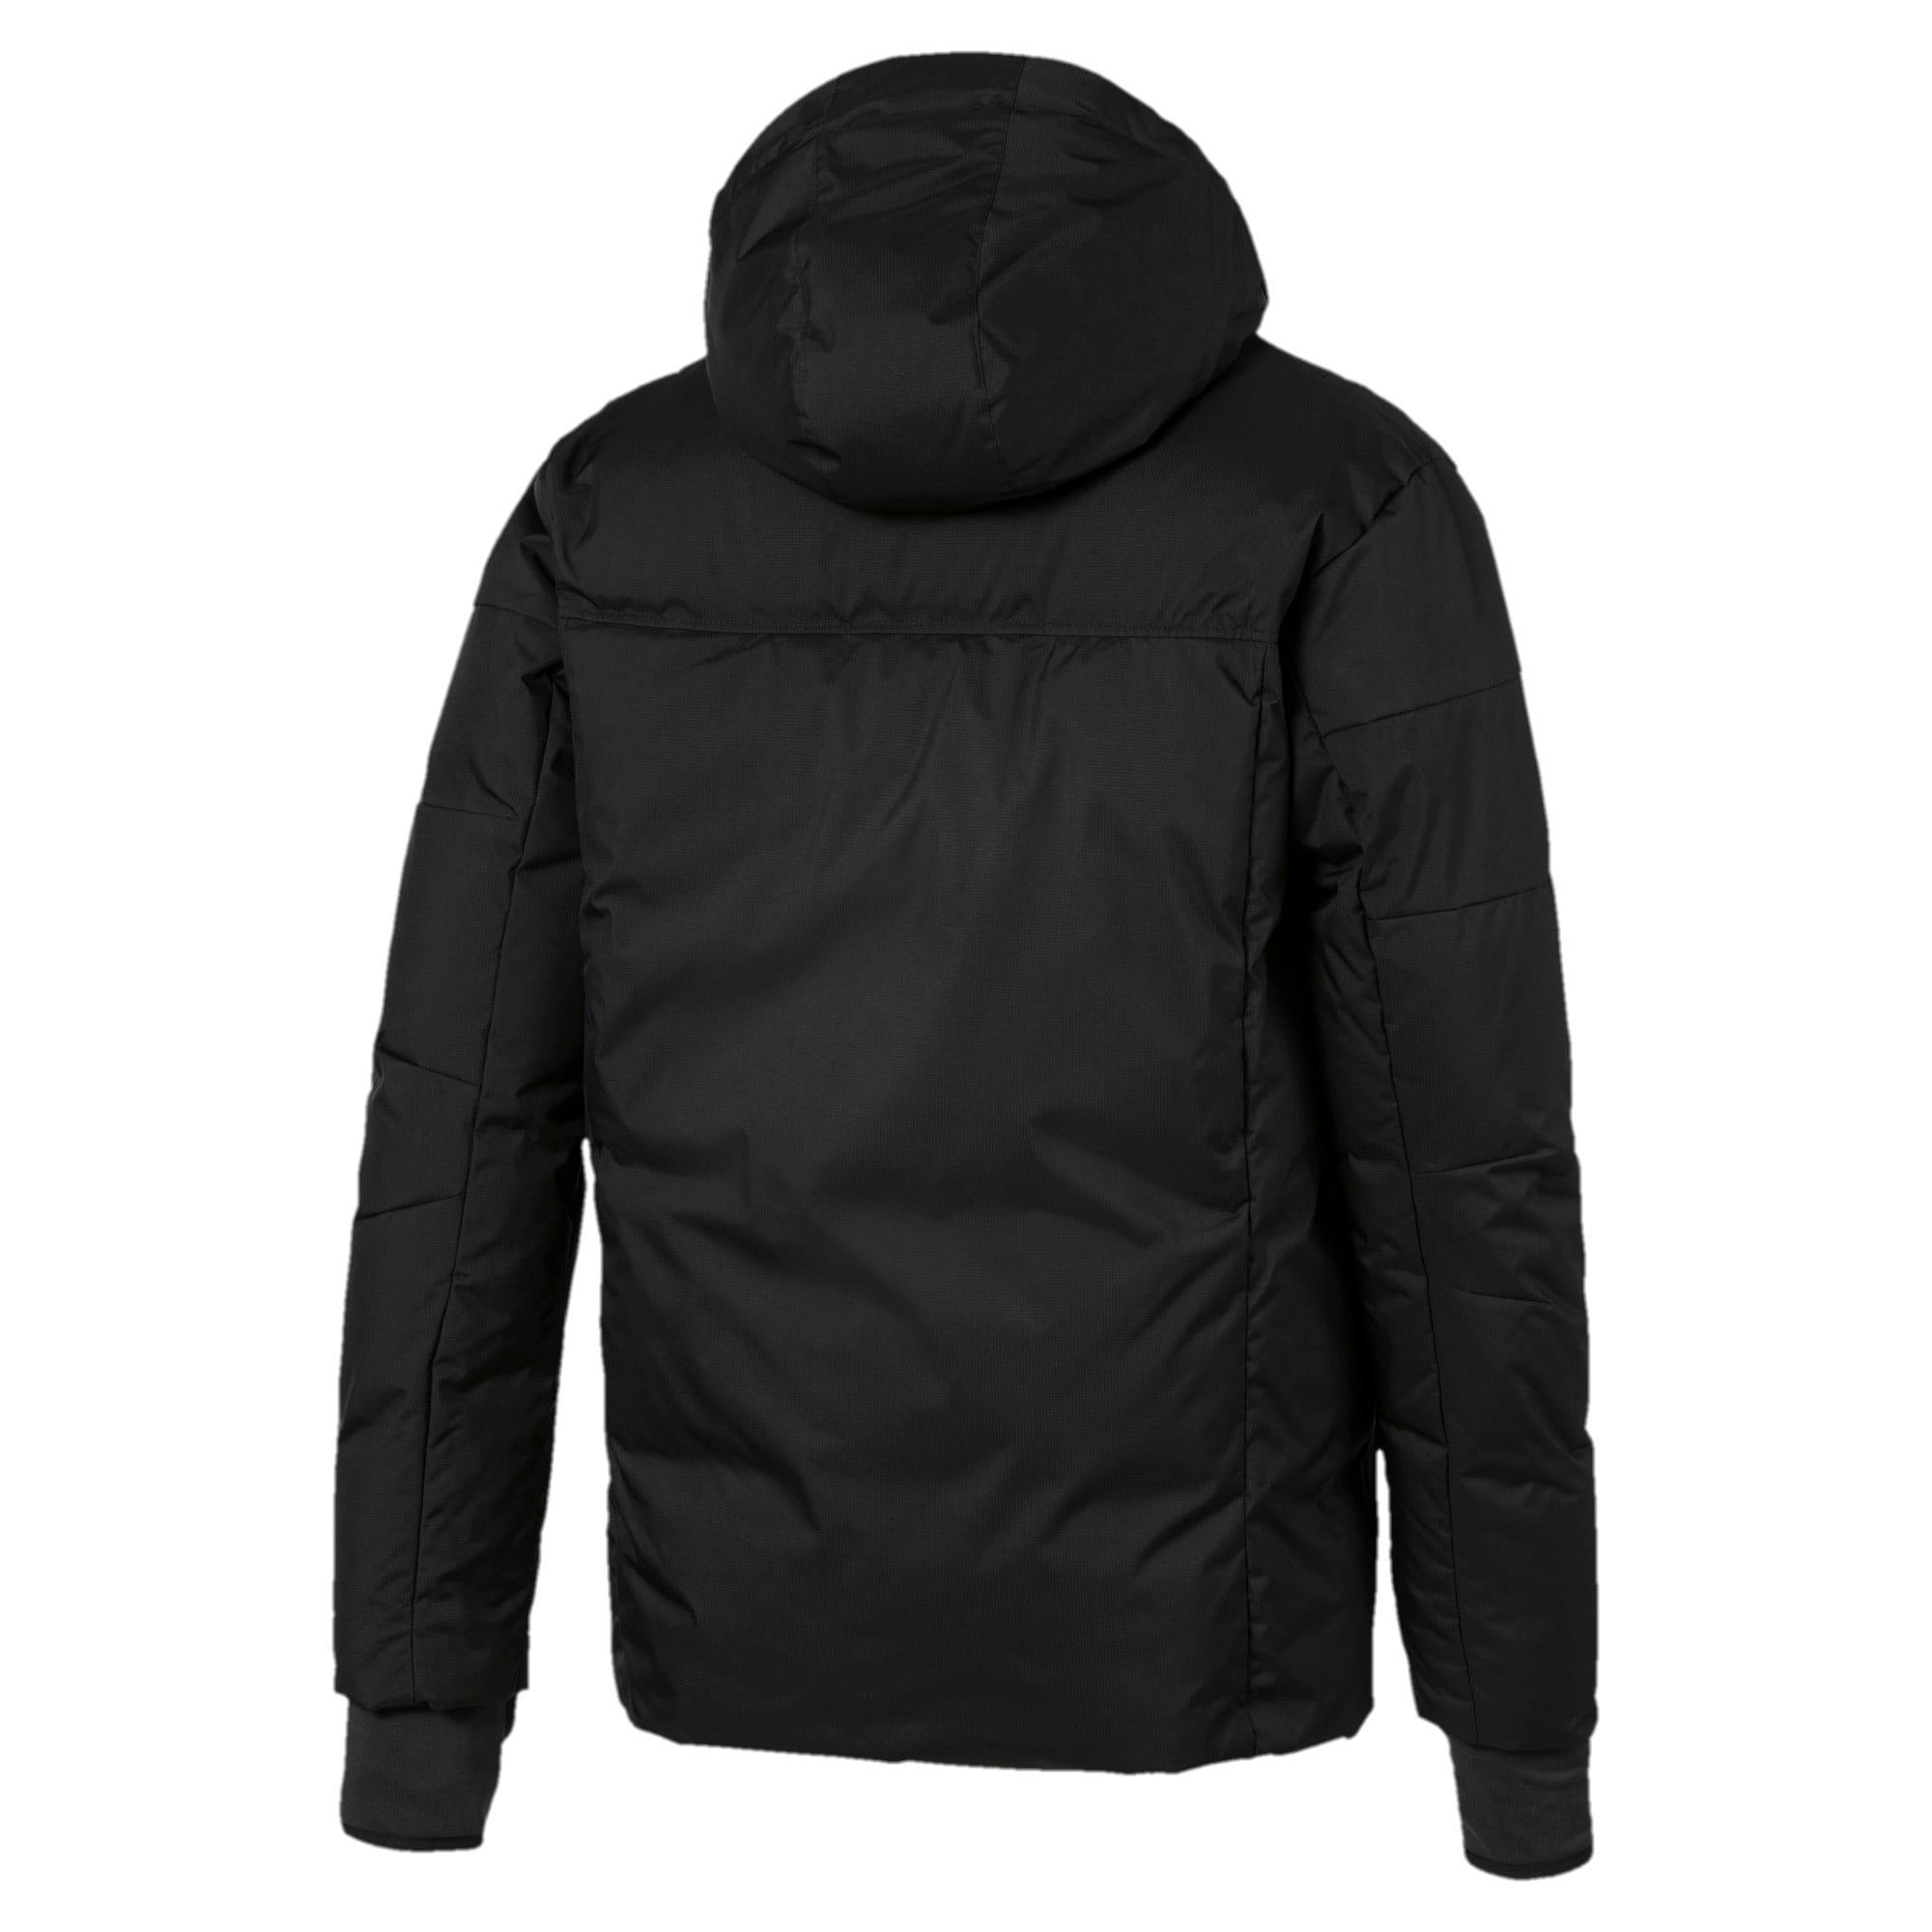 Thumbnail 5 of 650 Protective Down Men's Jacket, Puma Black, medium